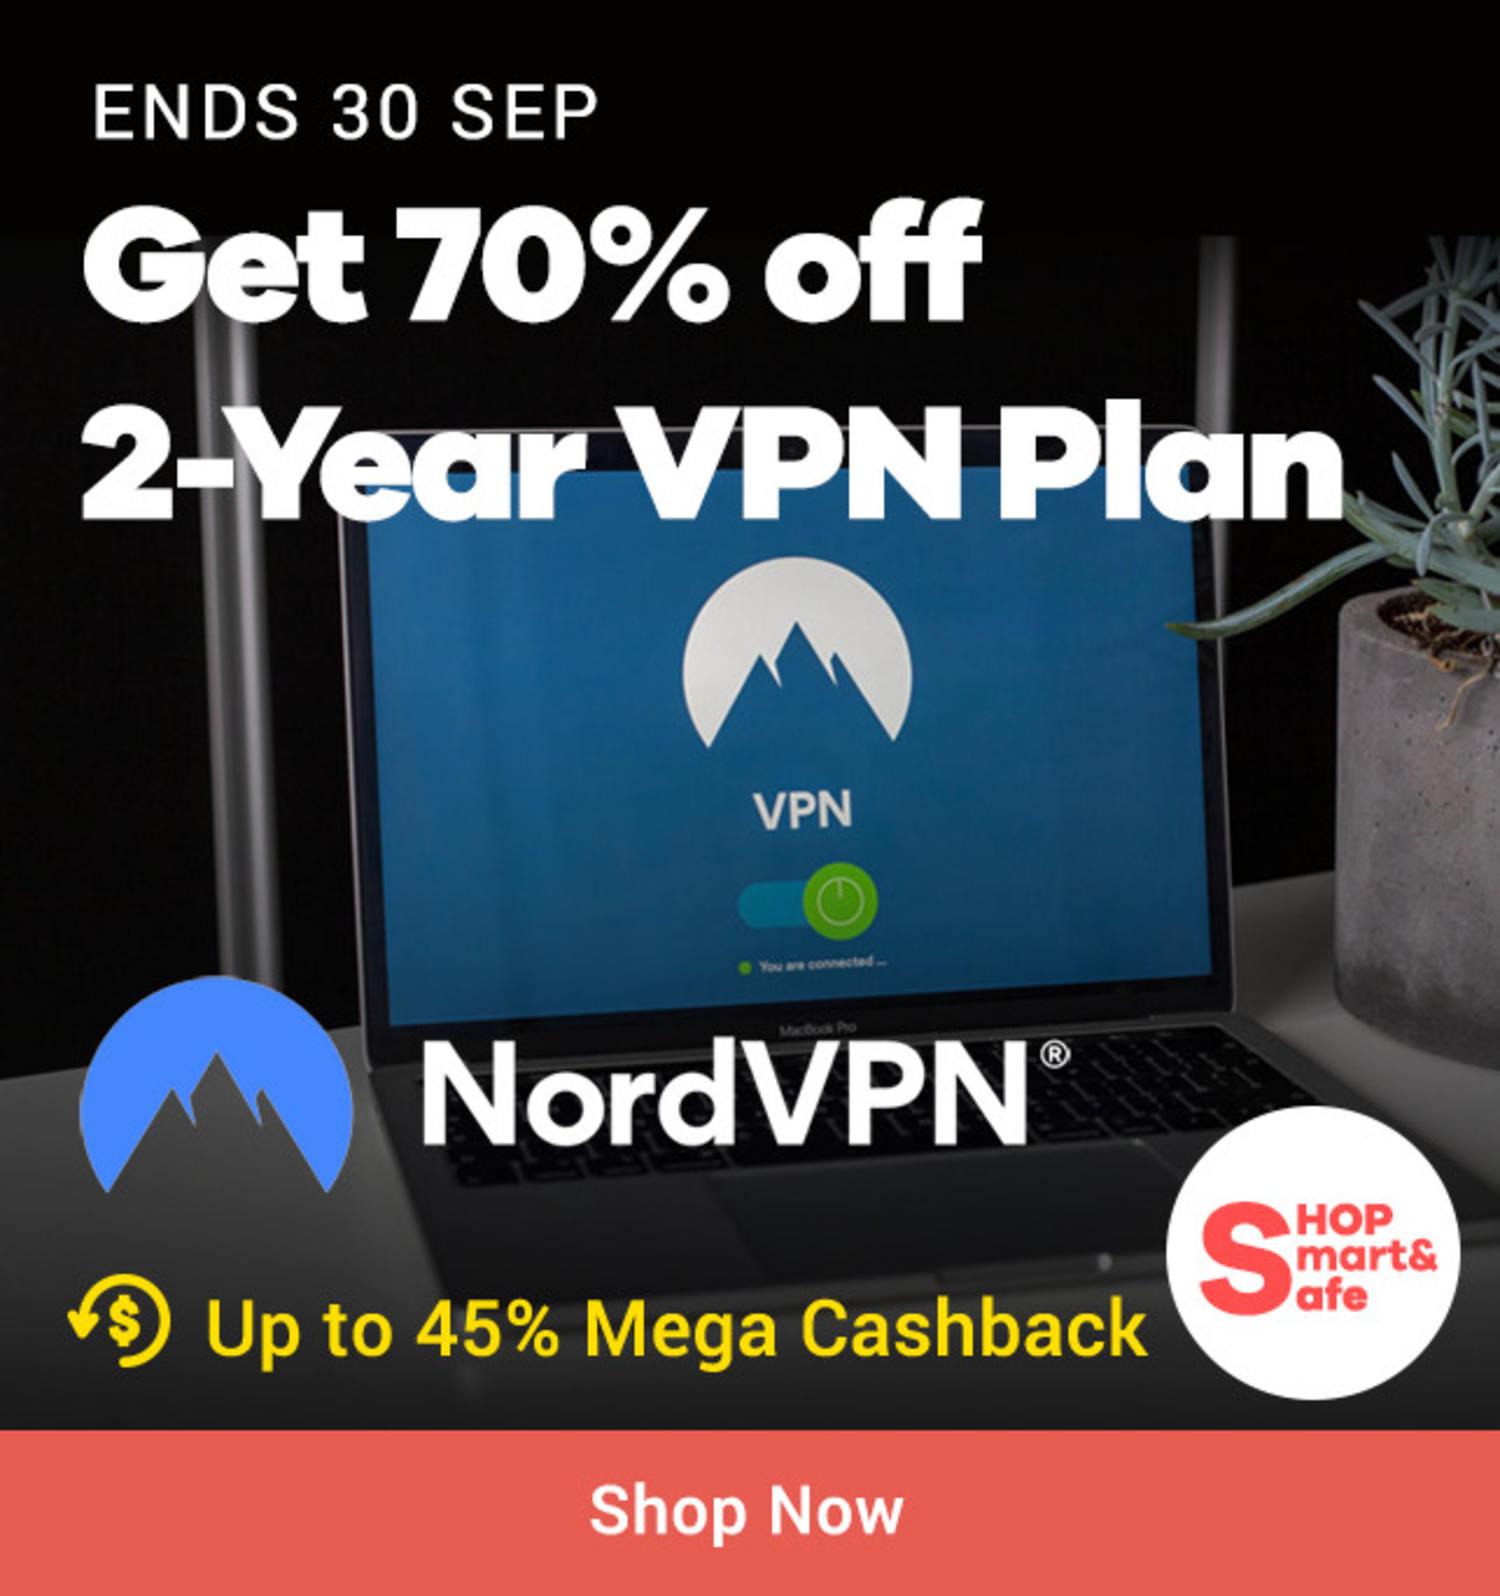 NordVPN: Get 70% off 2-Year VPN Plan